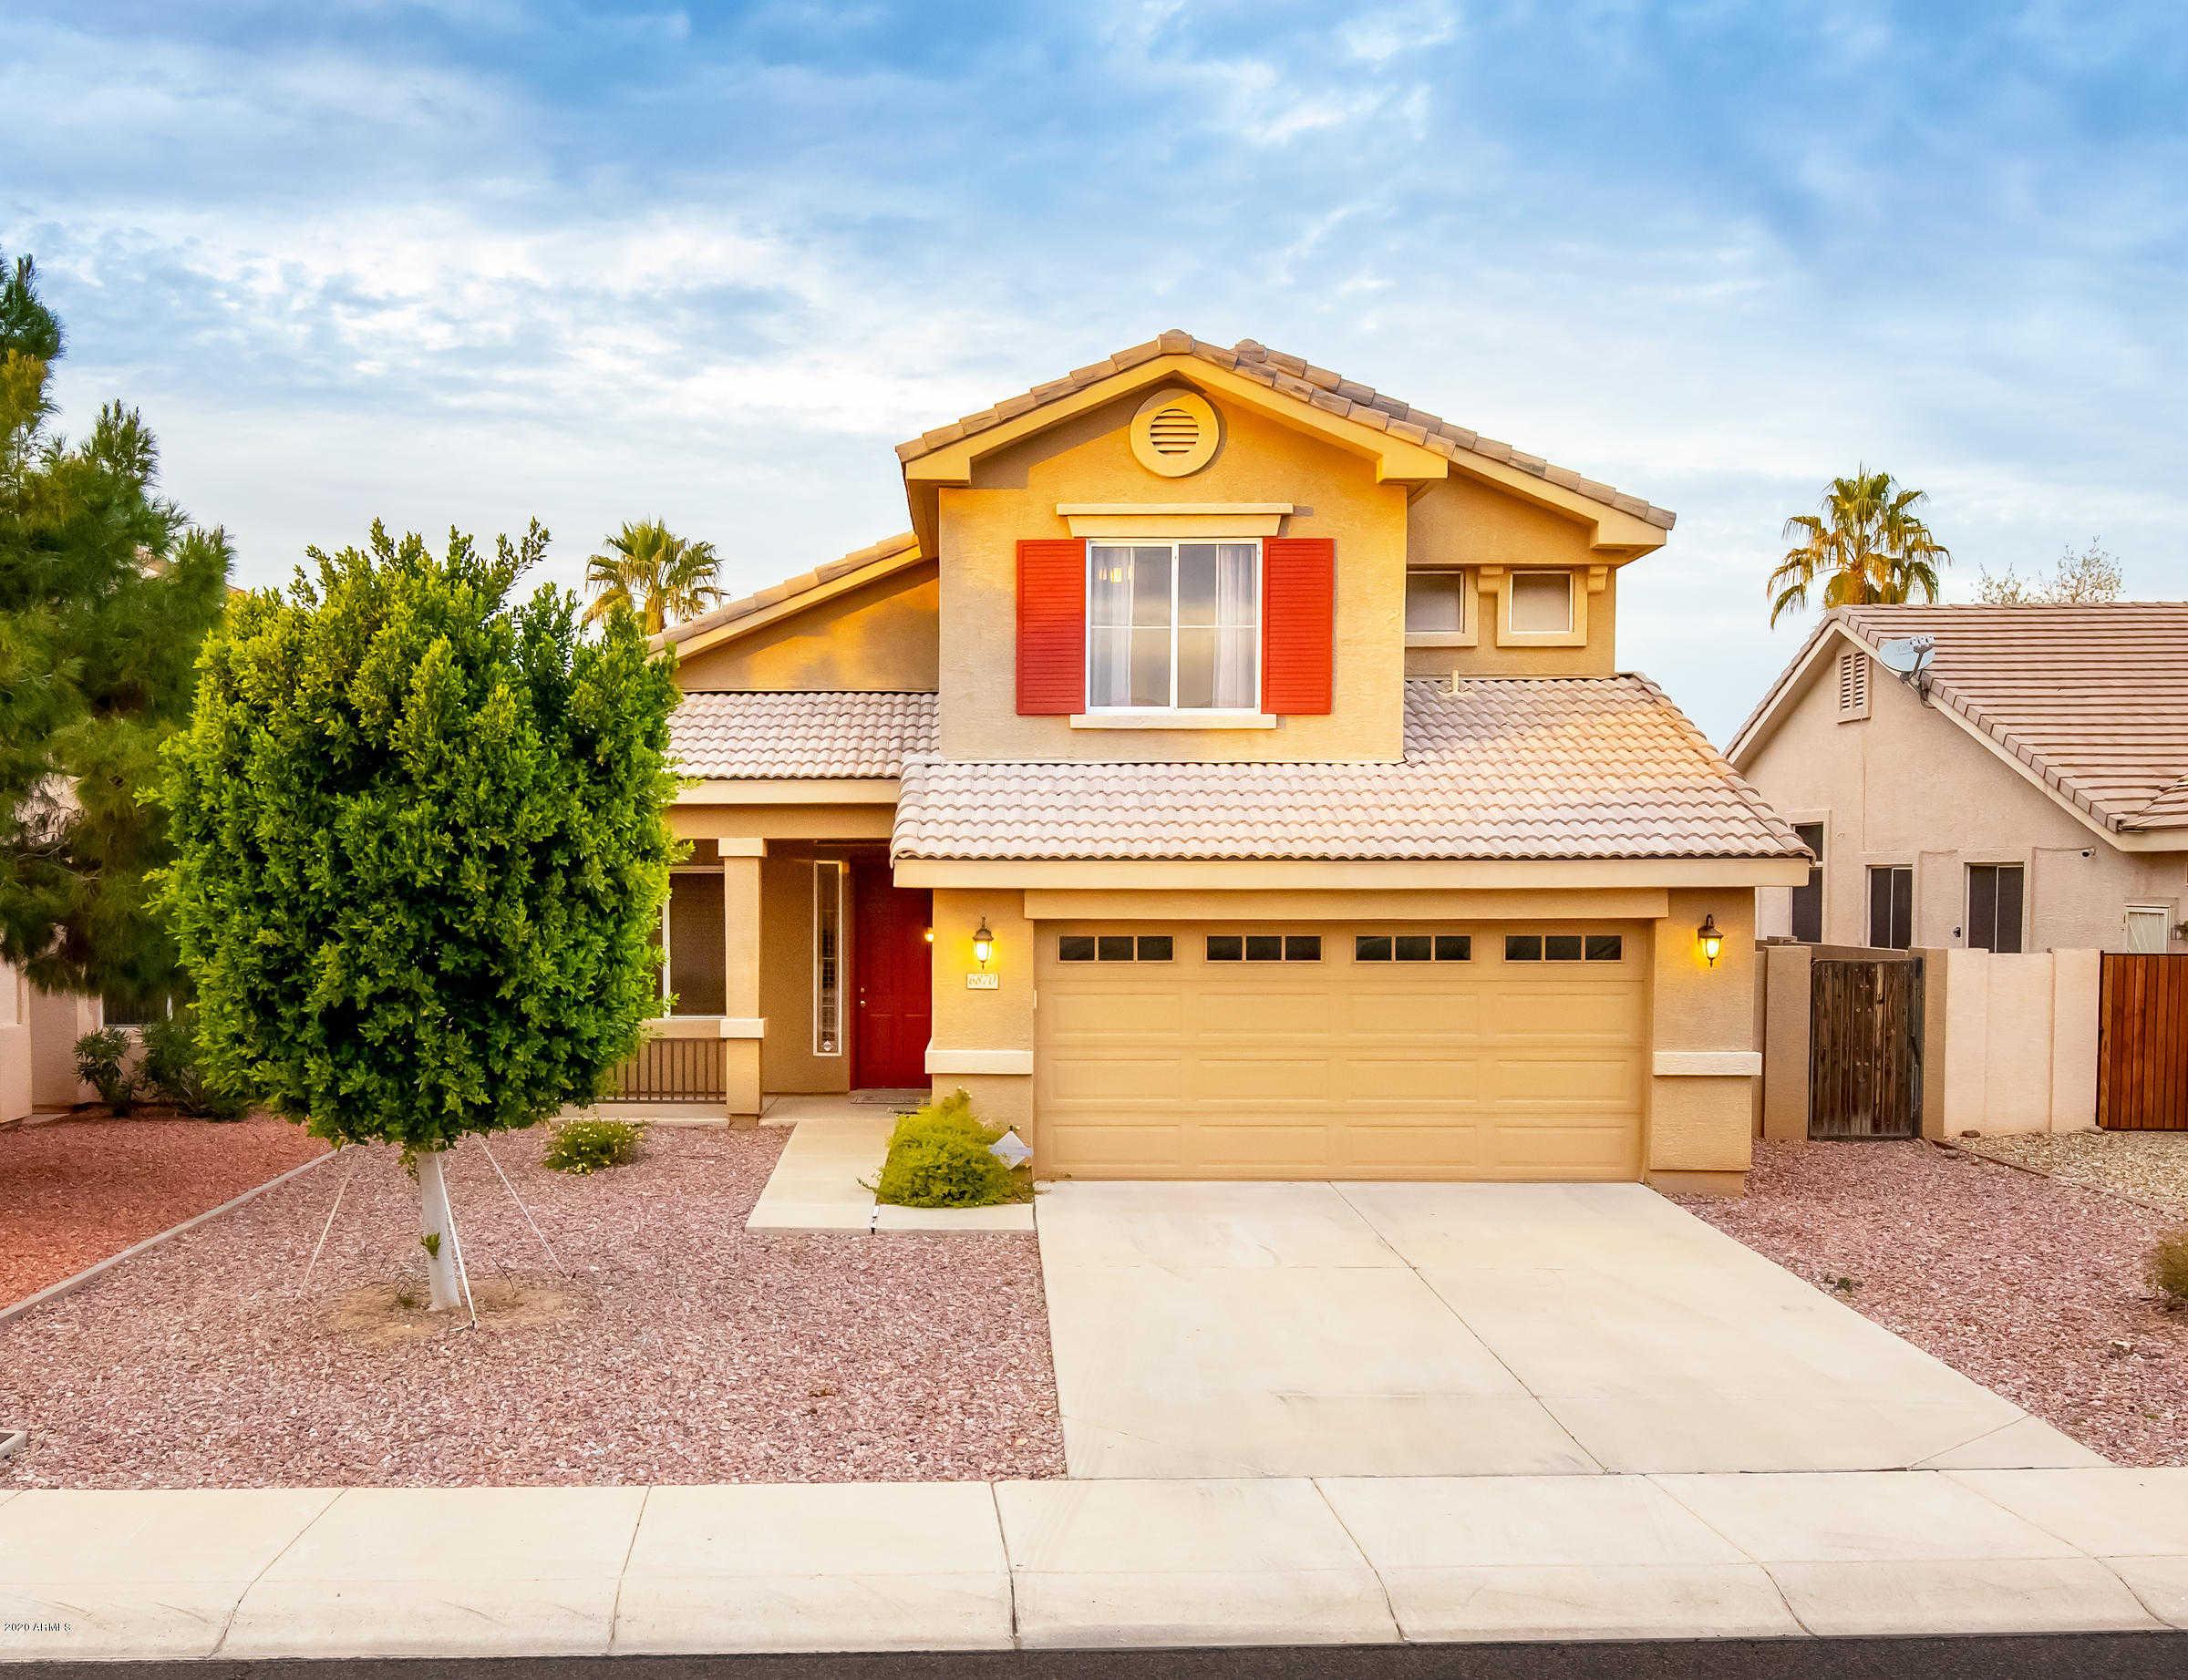 $359,900 - 4Br/3Ba - Home for Sale in Sierra Verde, Glendale